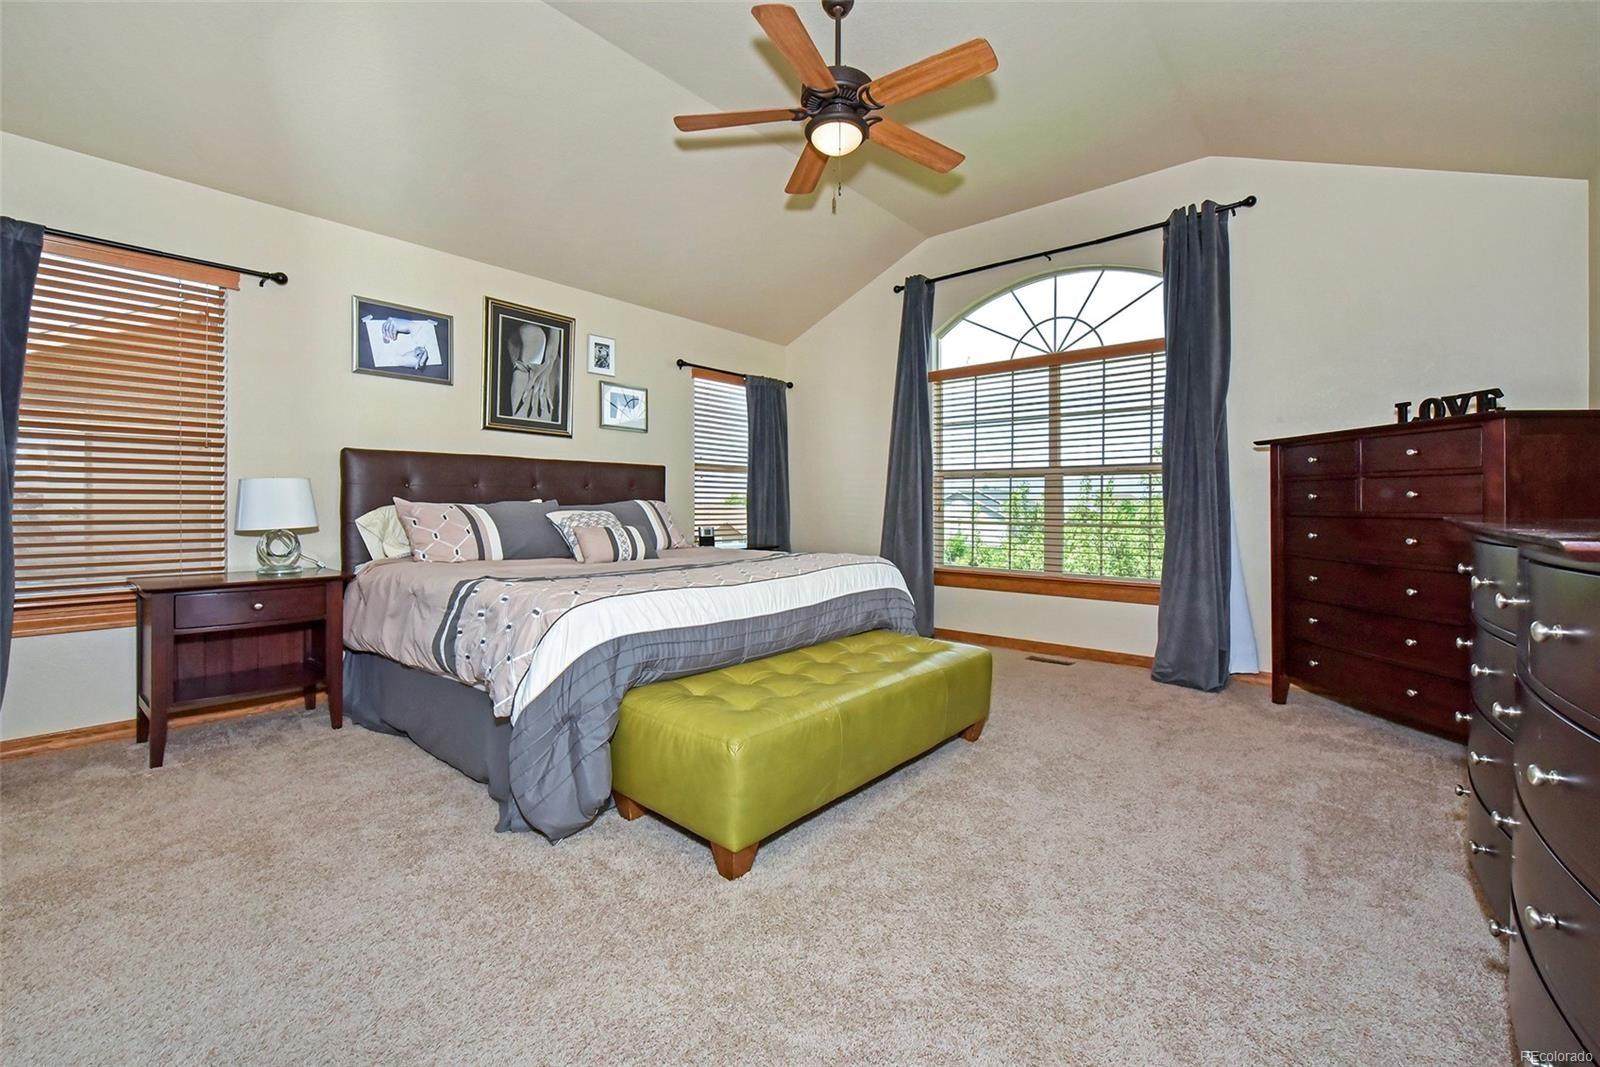 MLS# 9707951 - 8805  Country Creek Trail, Colorado Springs, CO 80924